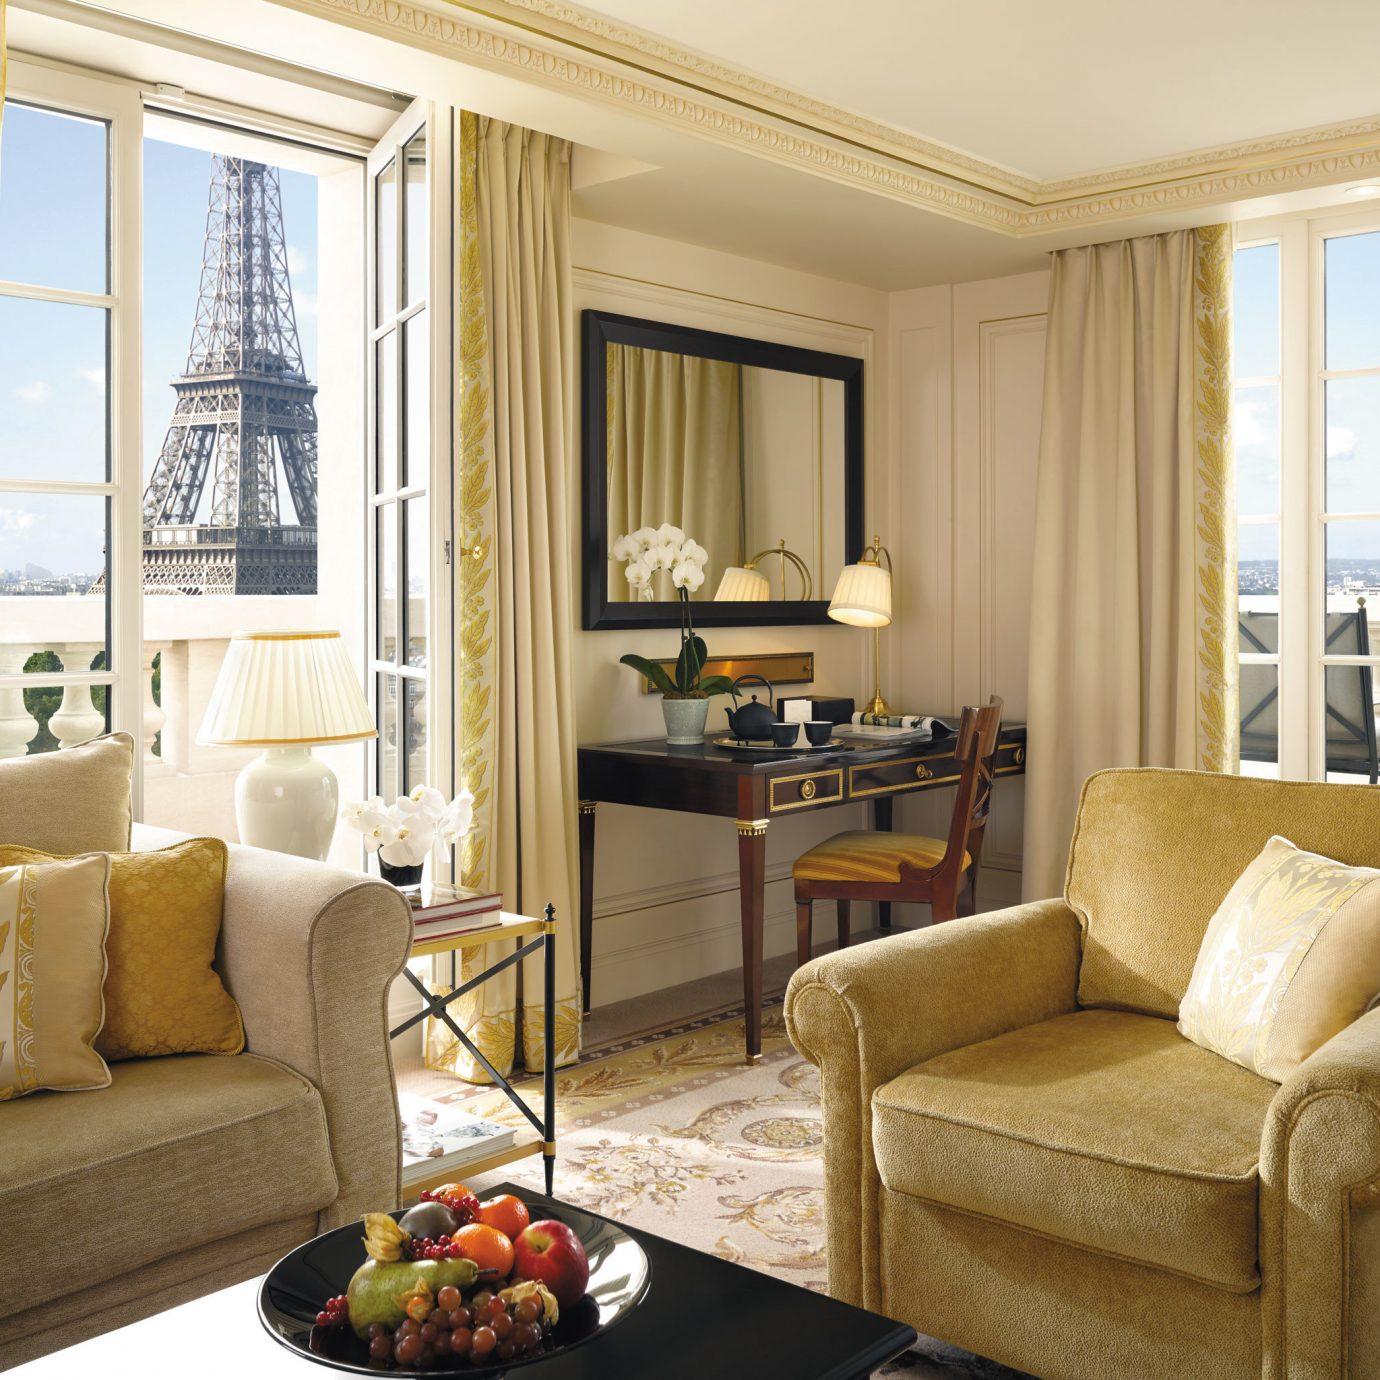 Bedroom Elegant Hip Historic Luxury Romantic Scenic views Suite sofa living room property home hardwood condominium cottage